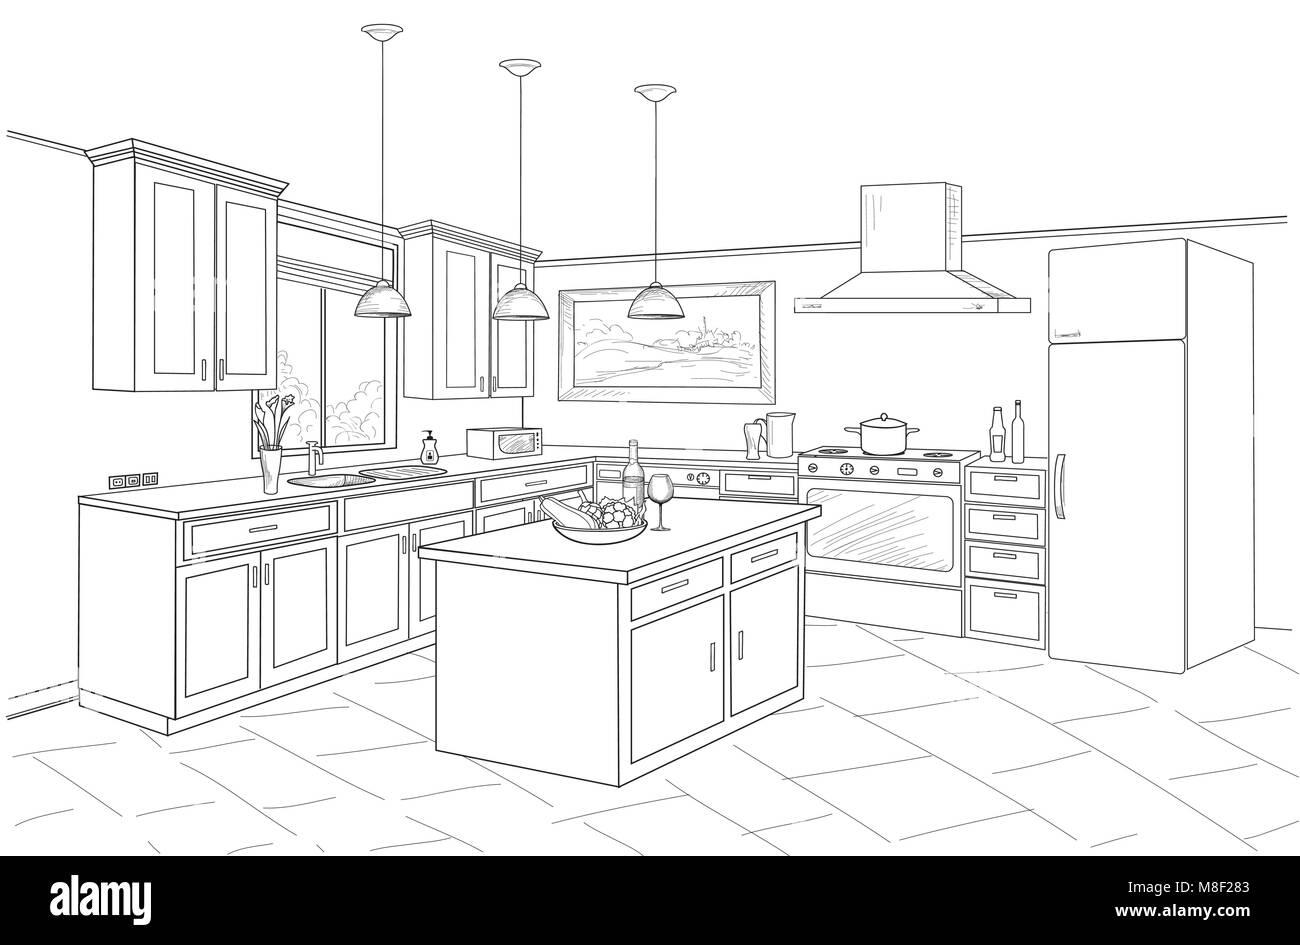 interior sketch of kitchen room outline blueprint design of kitchen